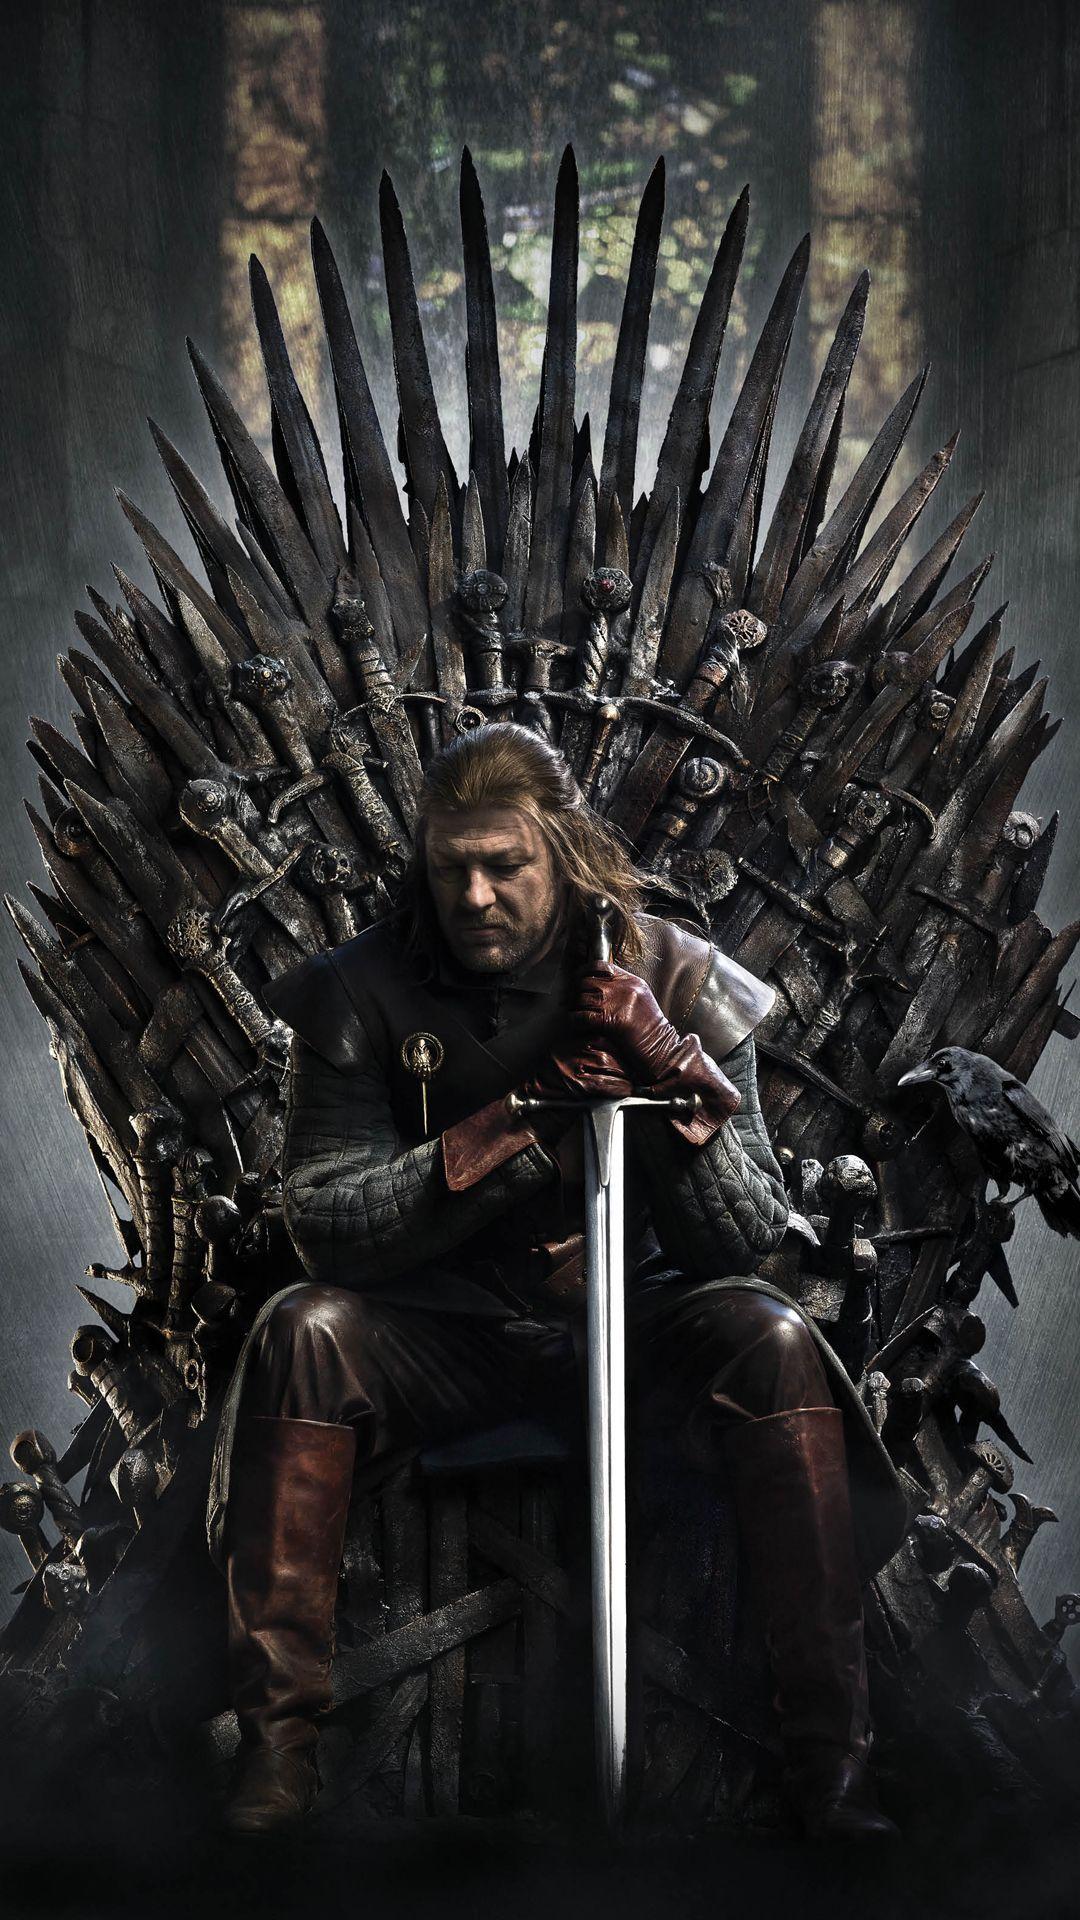 50 Game Of Thrones Mobile Wallpaper On Wallpapersafari